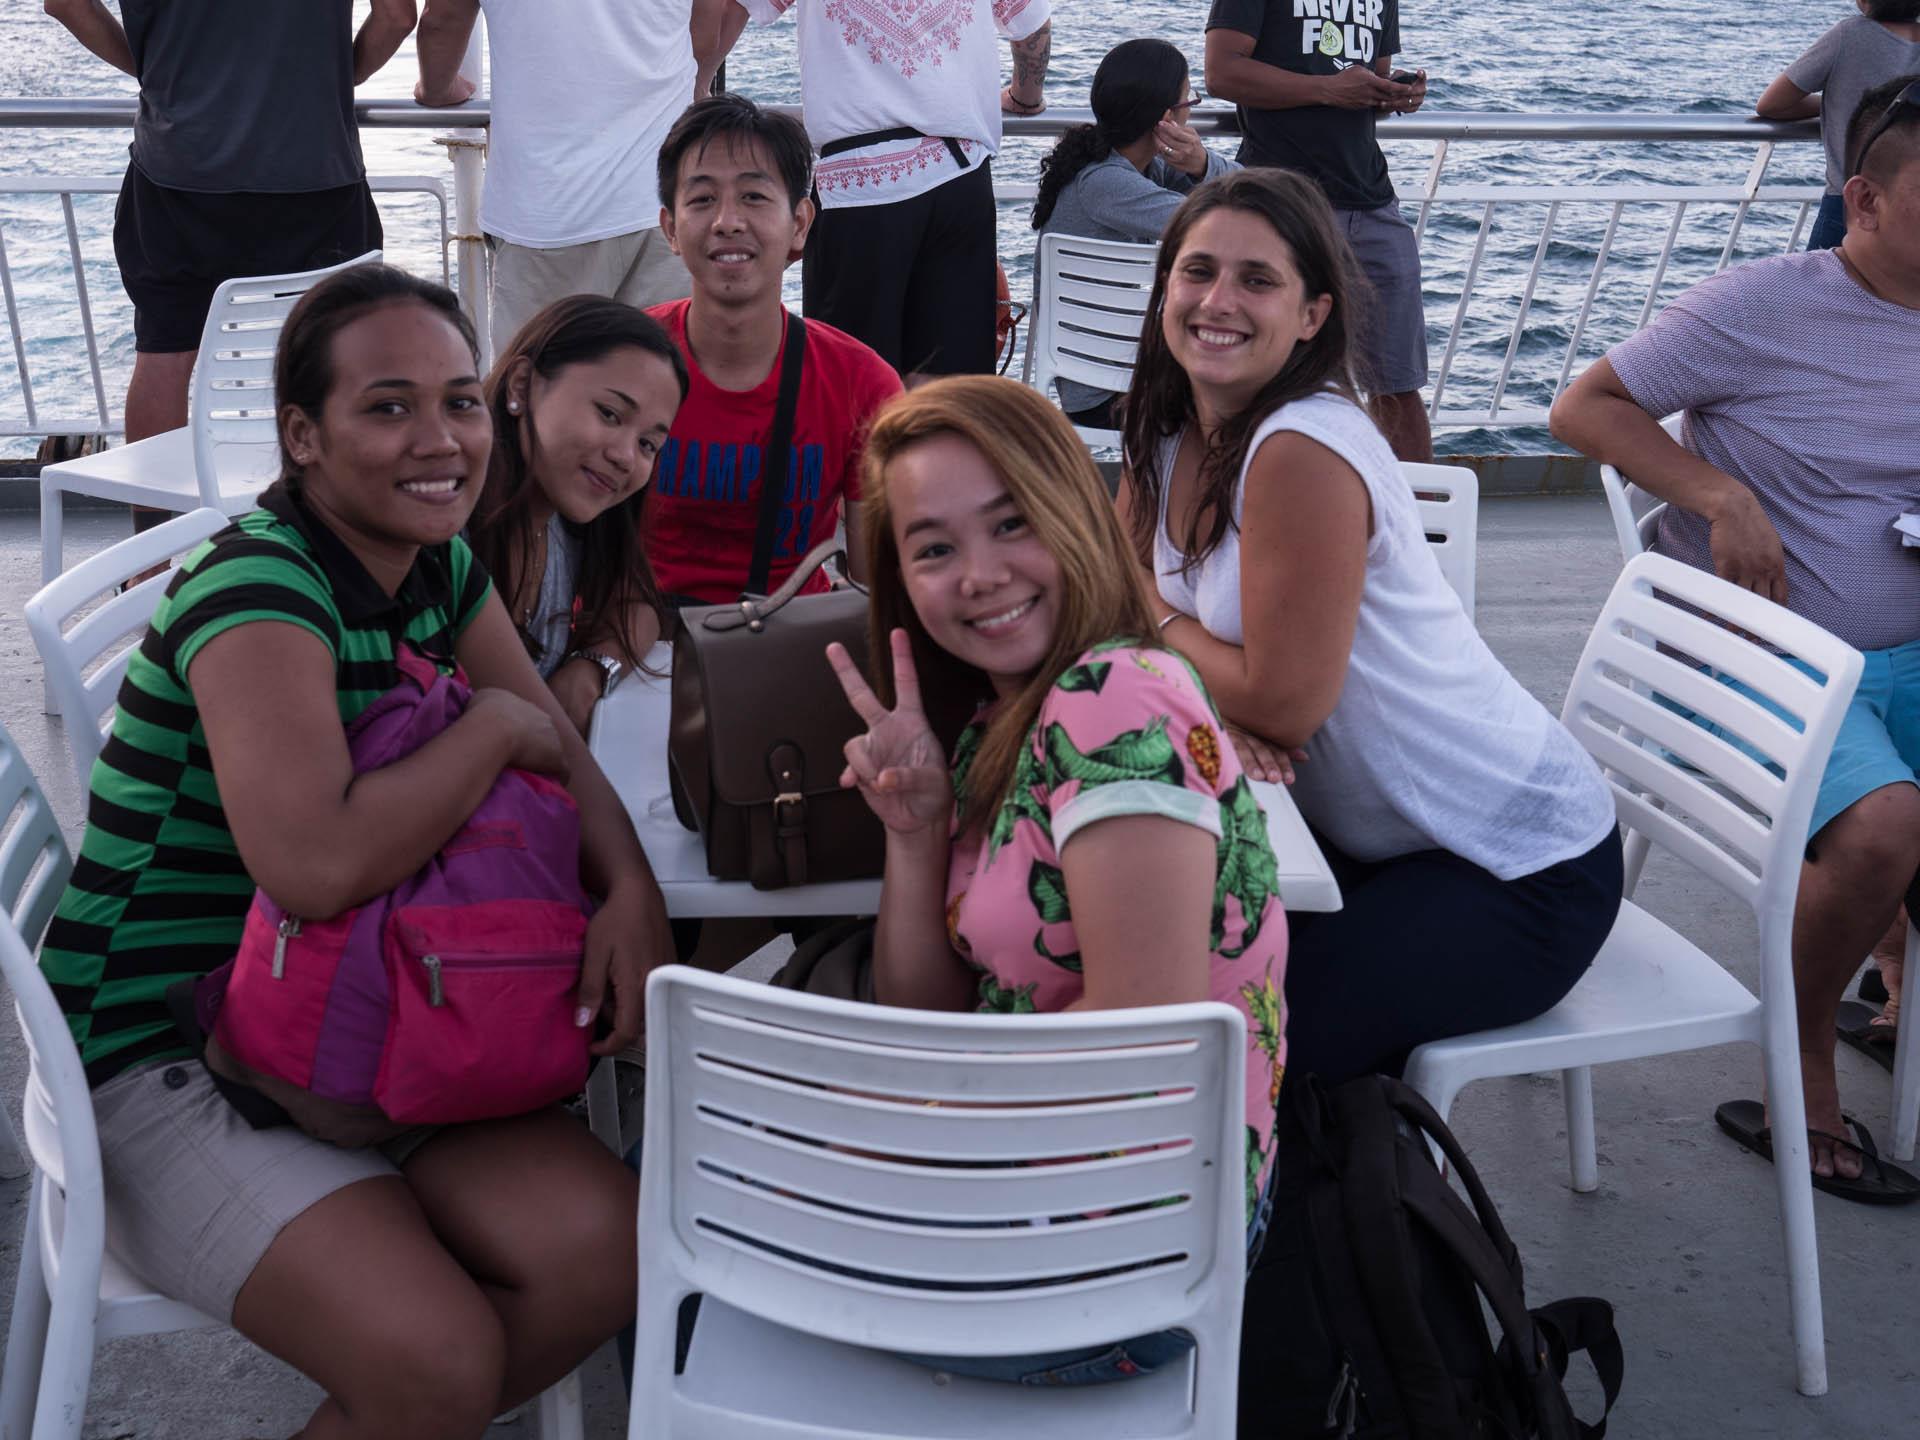 Coron ferry amis - Les globe blogueurs - blog voyage nature